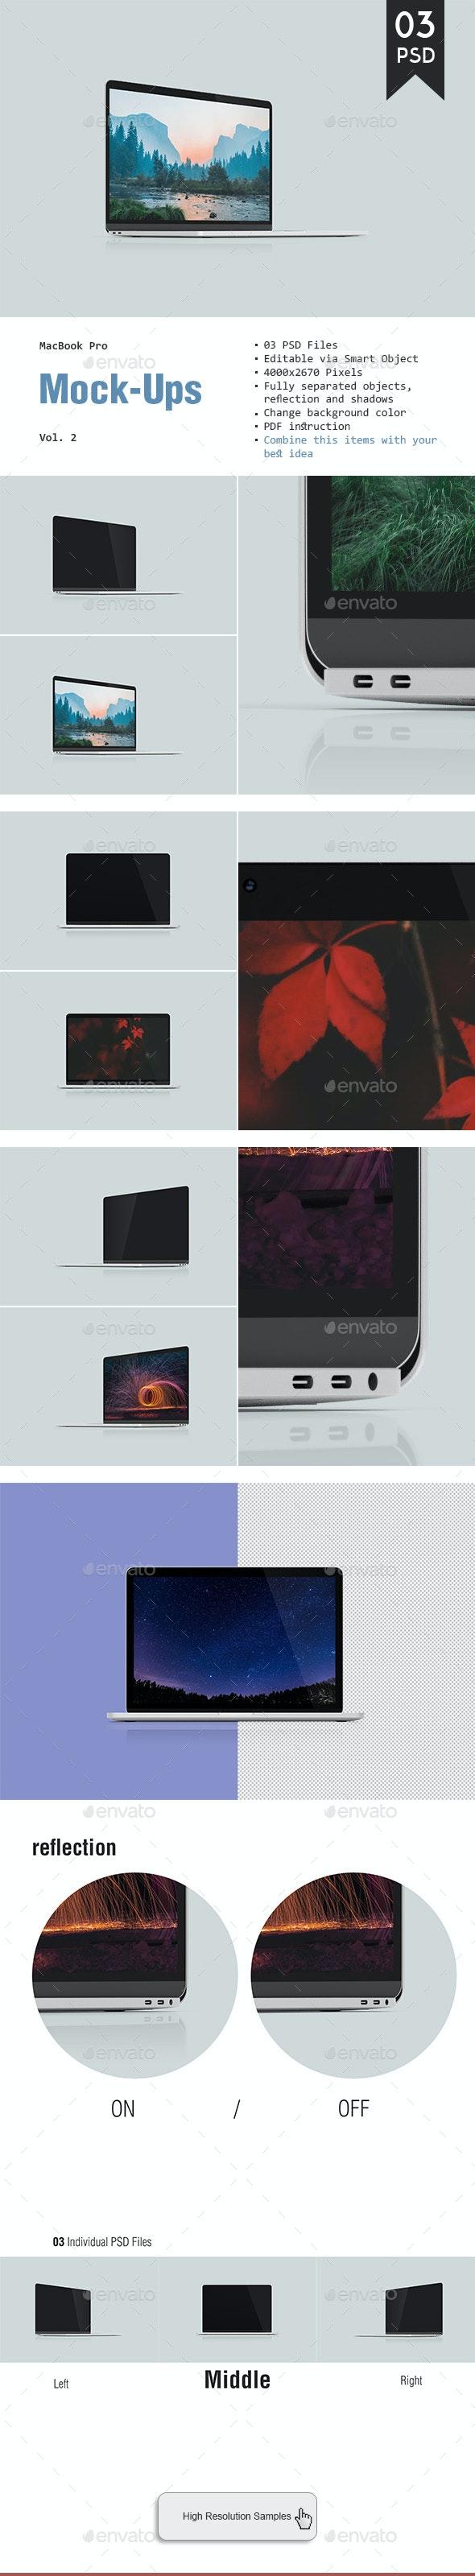 MacBook Pro Mockup - Laptop Displays